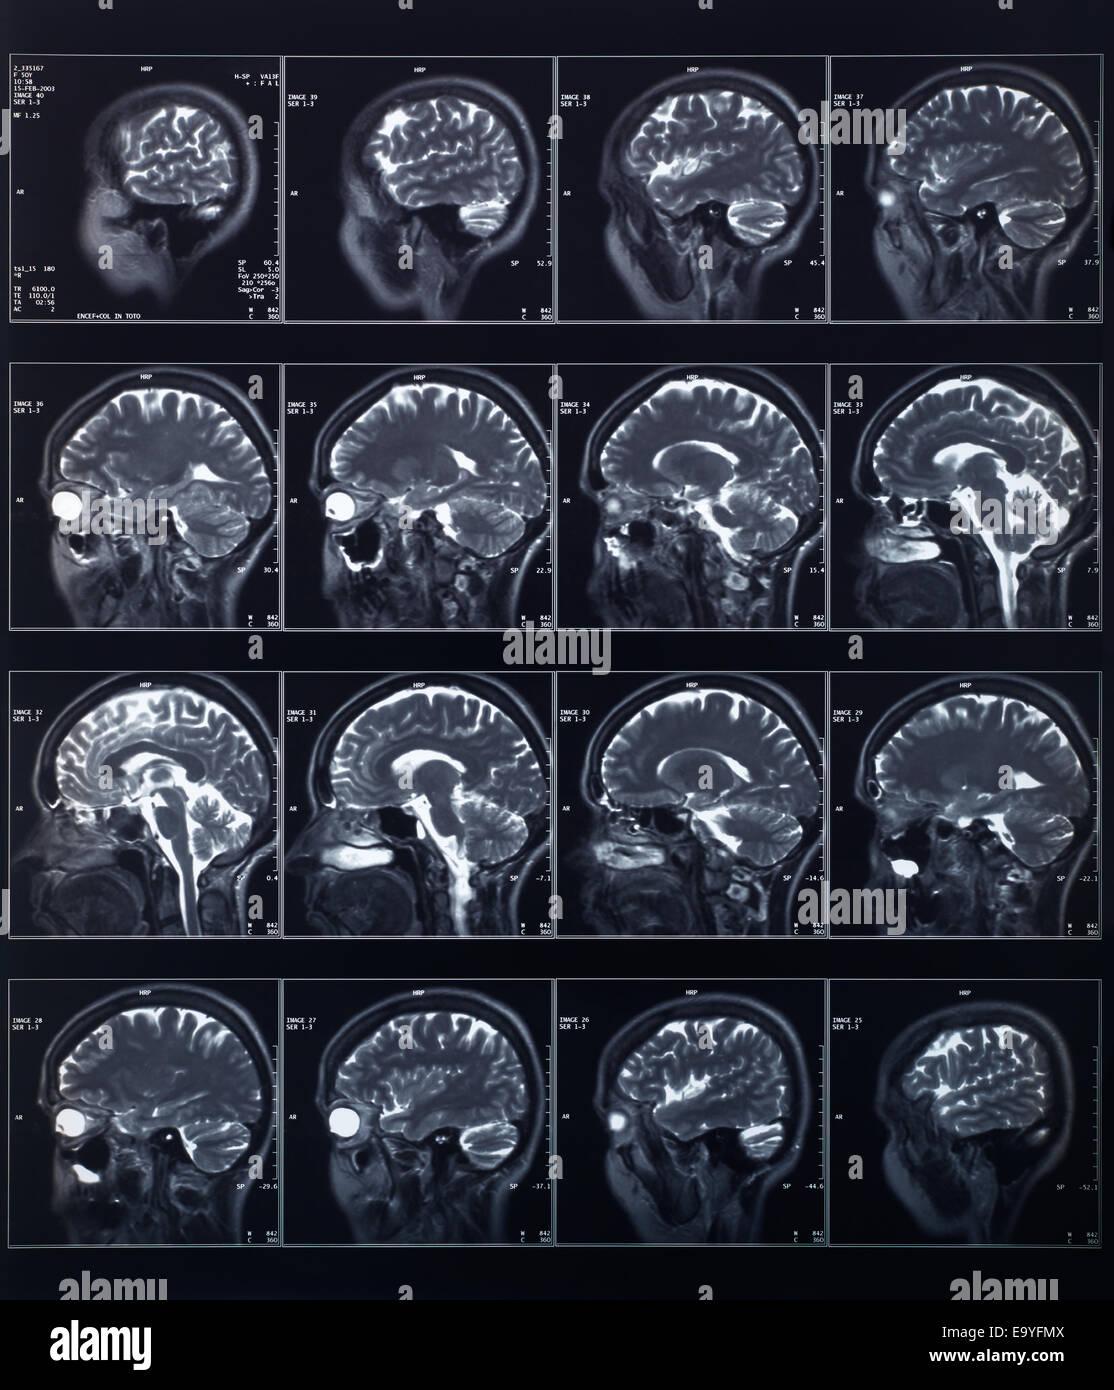 X-ray head and brain radiography - Stock Image